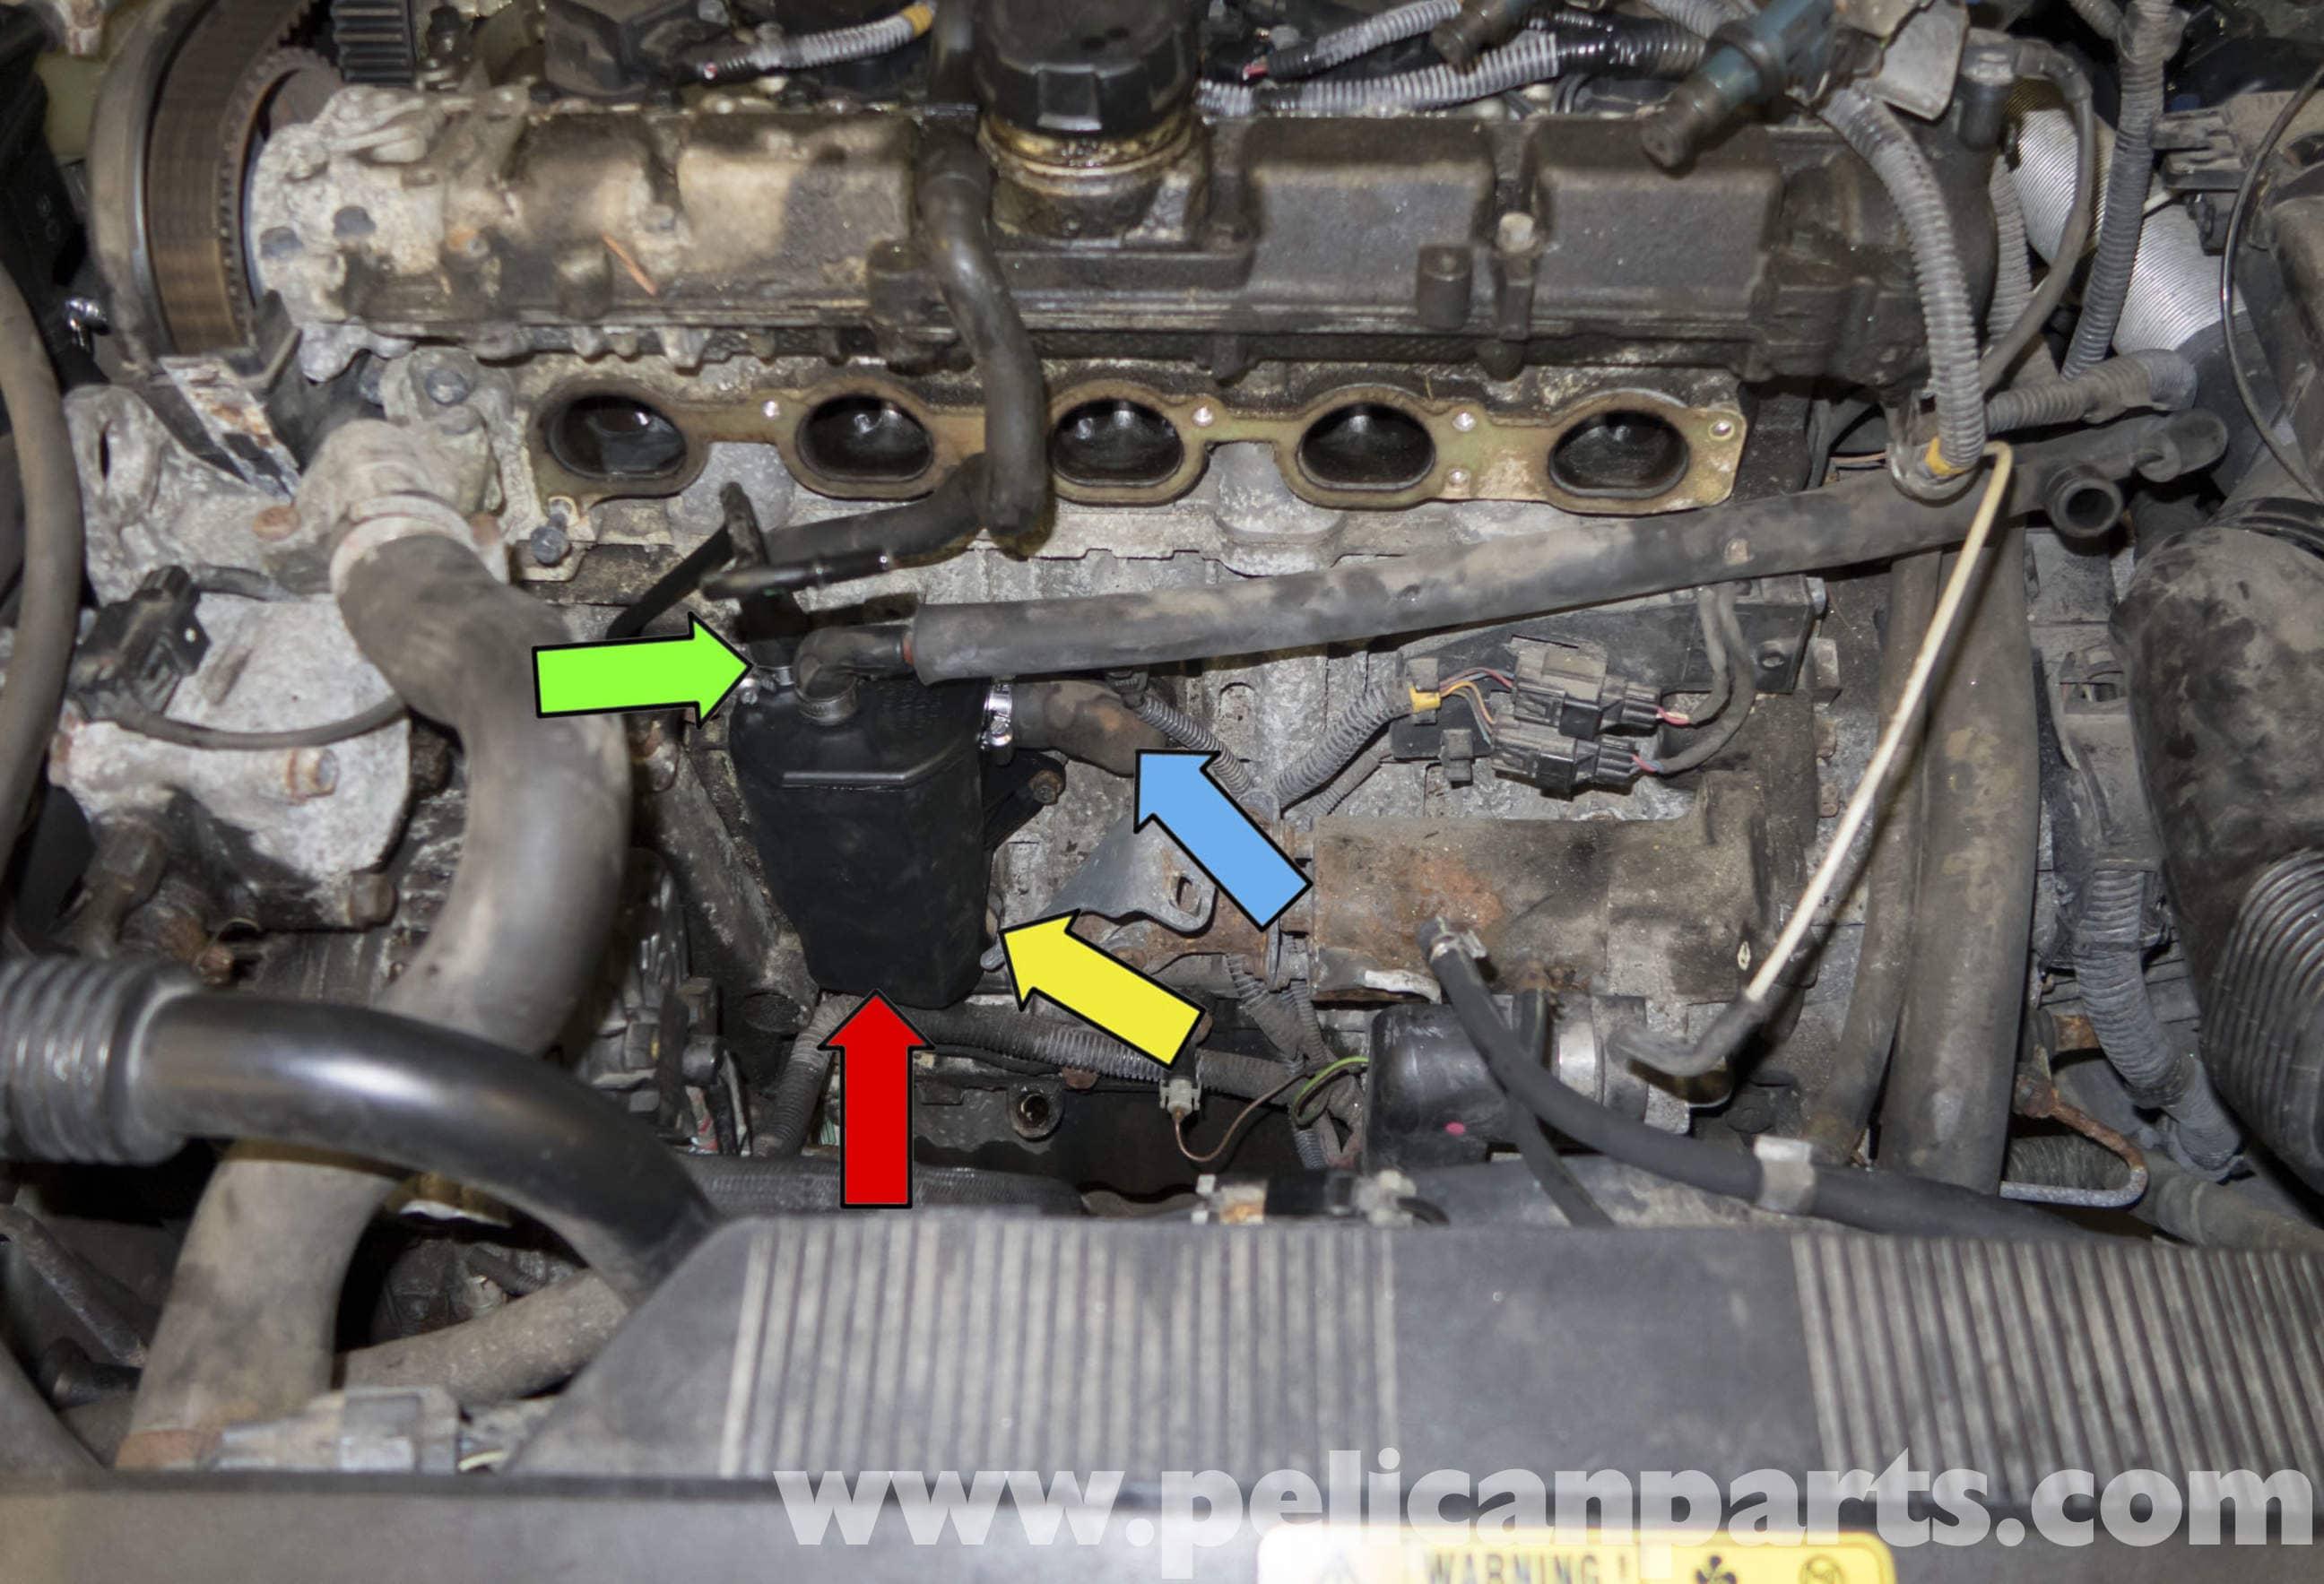 Volvo V70 Crankcase Breather Replacement 1998 2007